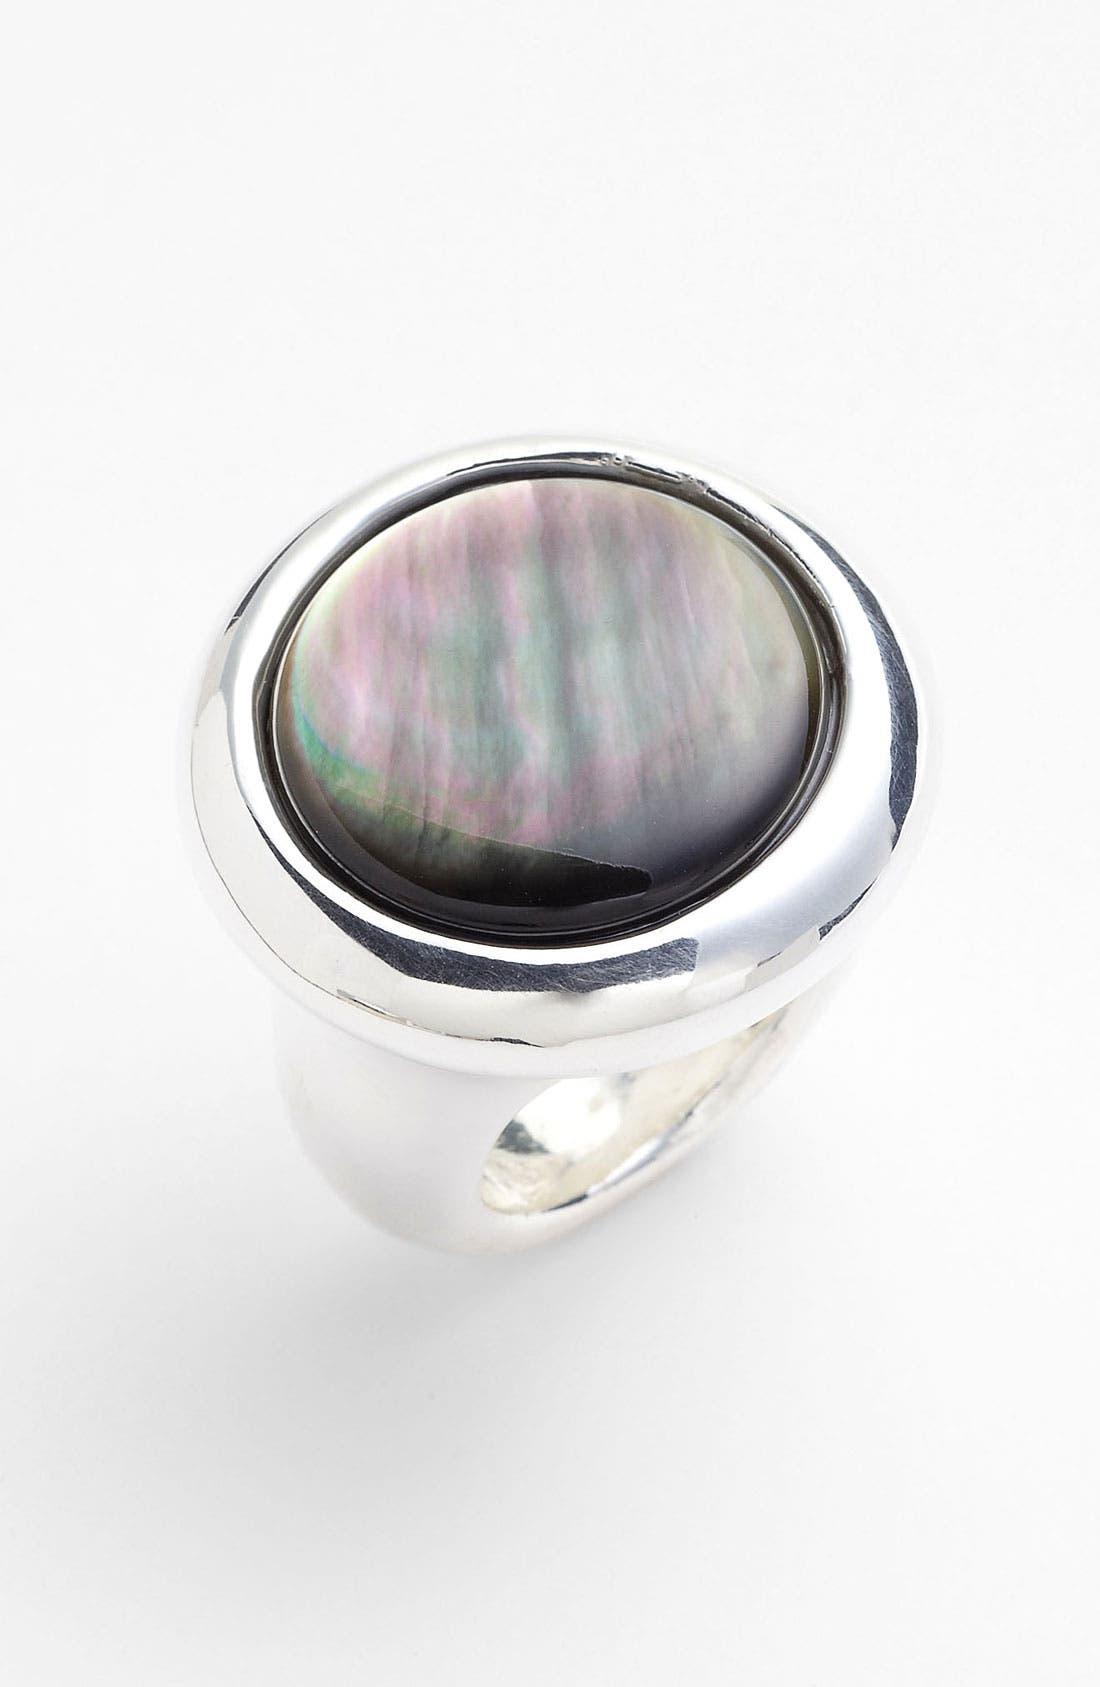 Main Image - Simon Sebbag 'Tahiti' Round Ring